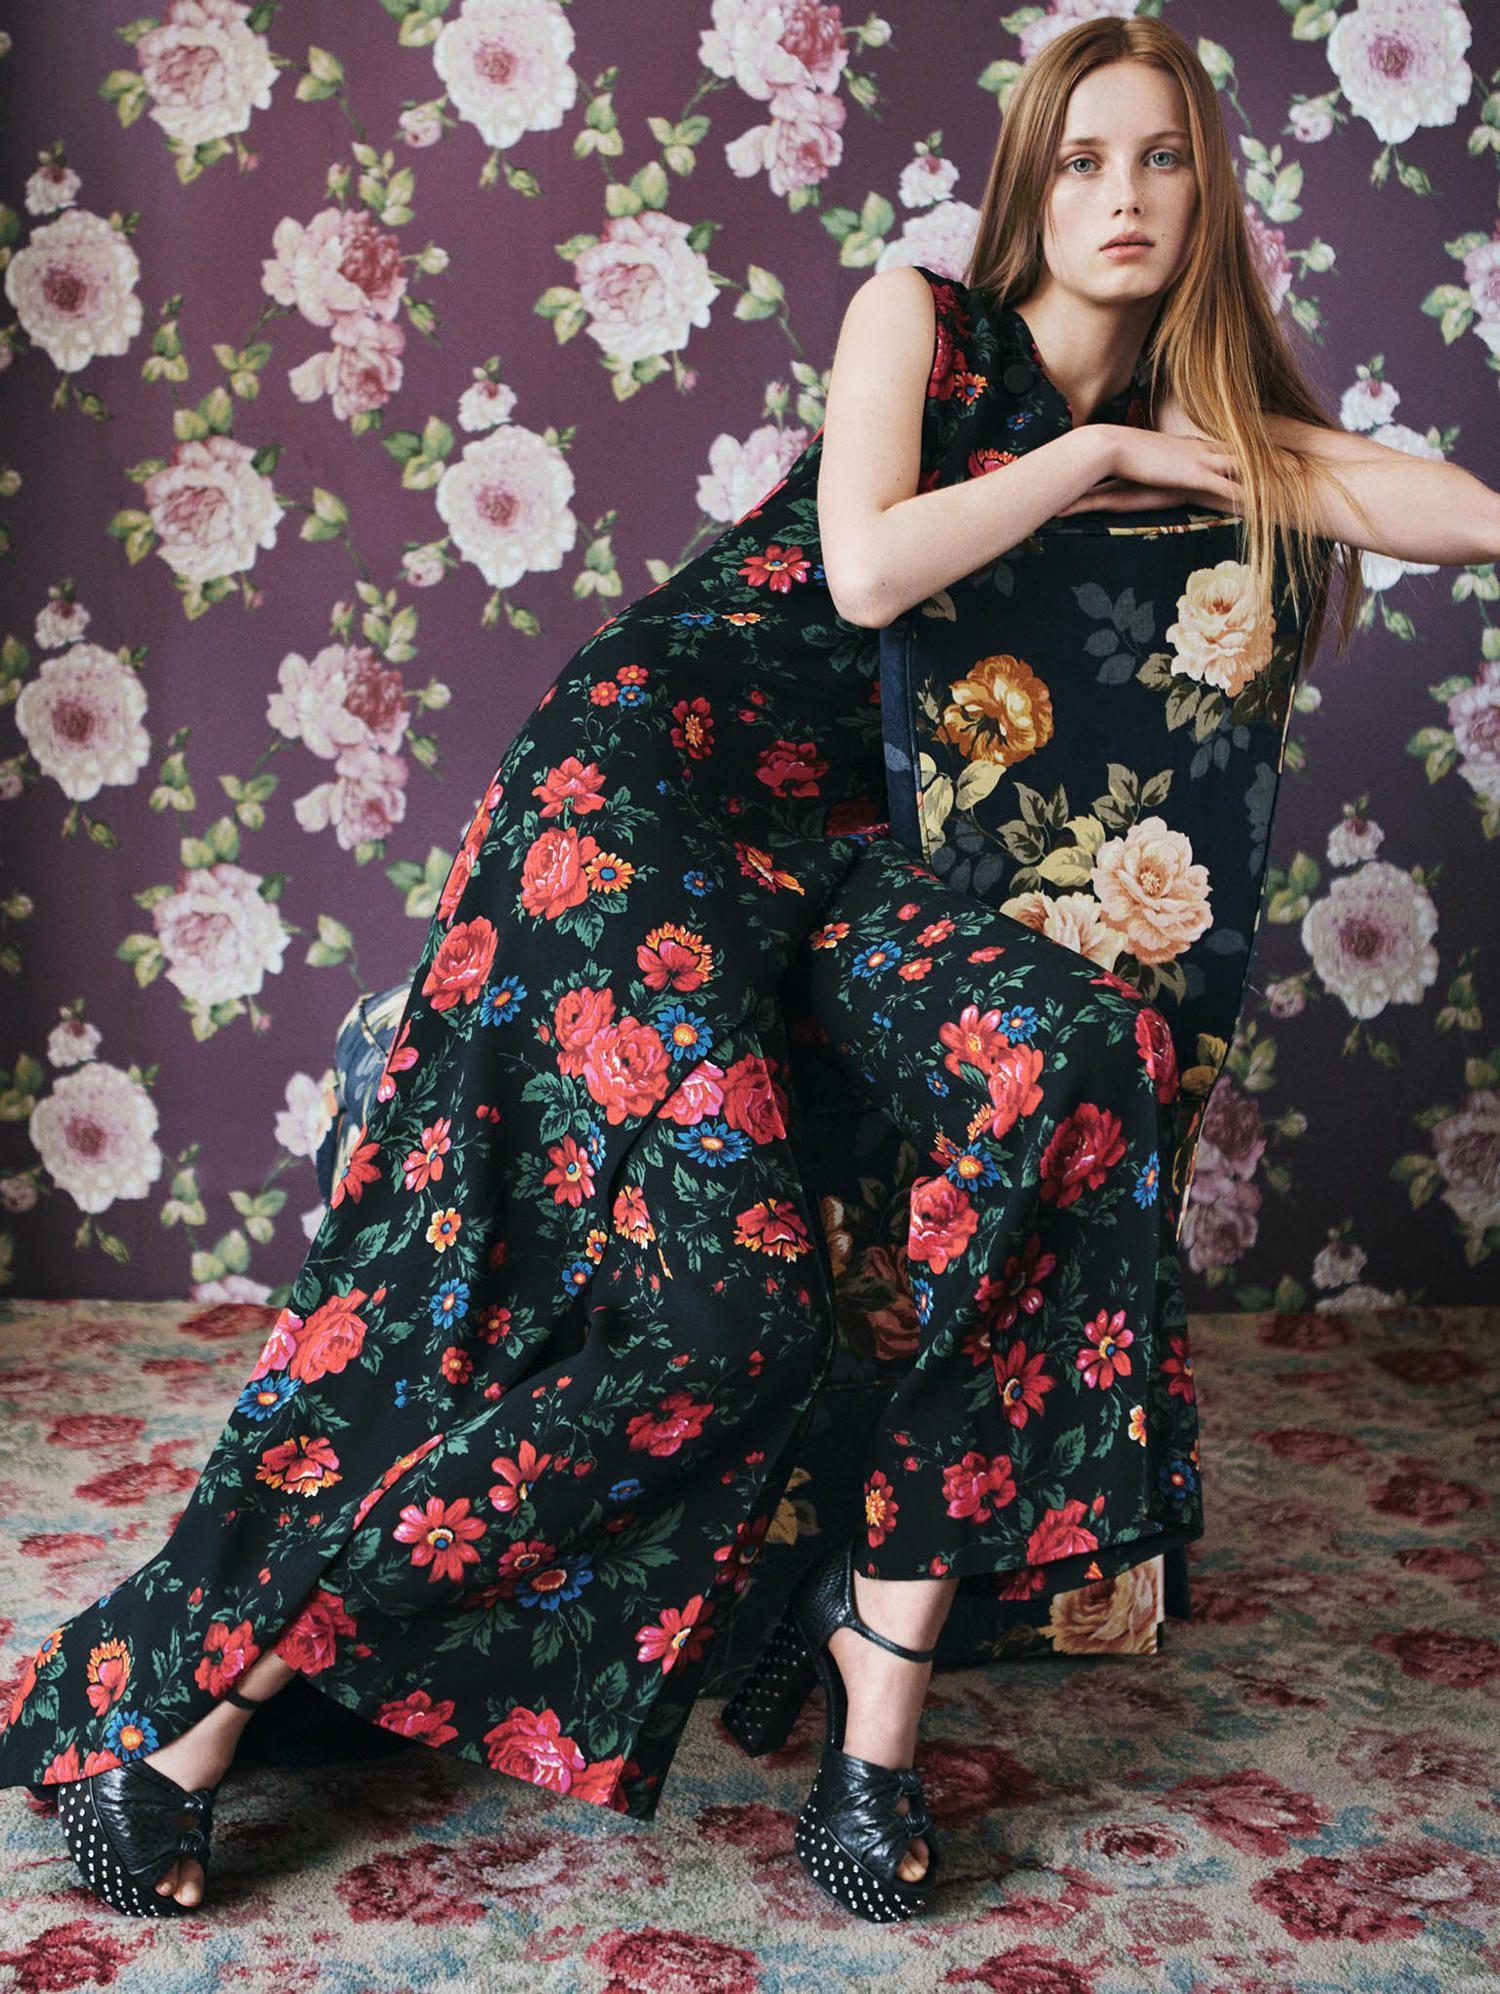 Rianne van Rompaey by Daniel Jackson for Vogue China April 2015